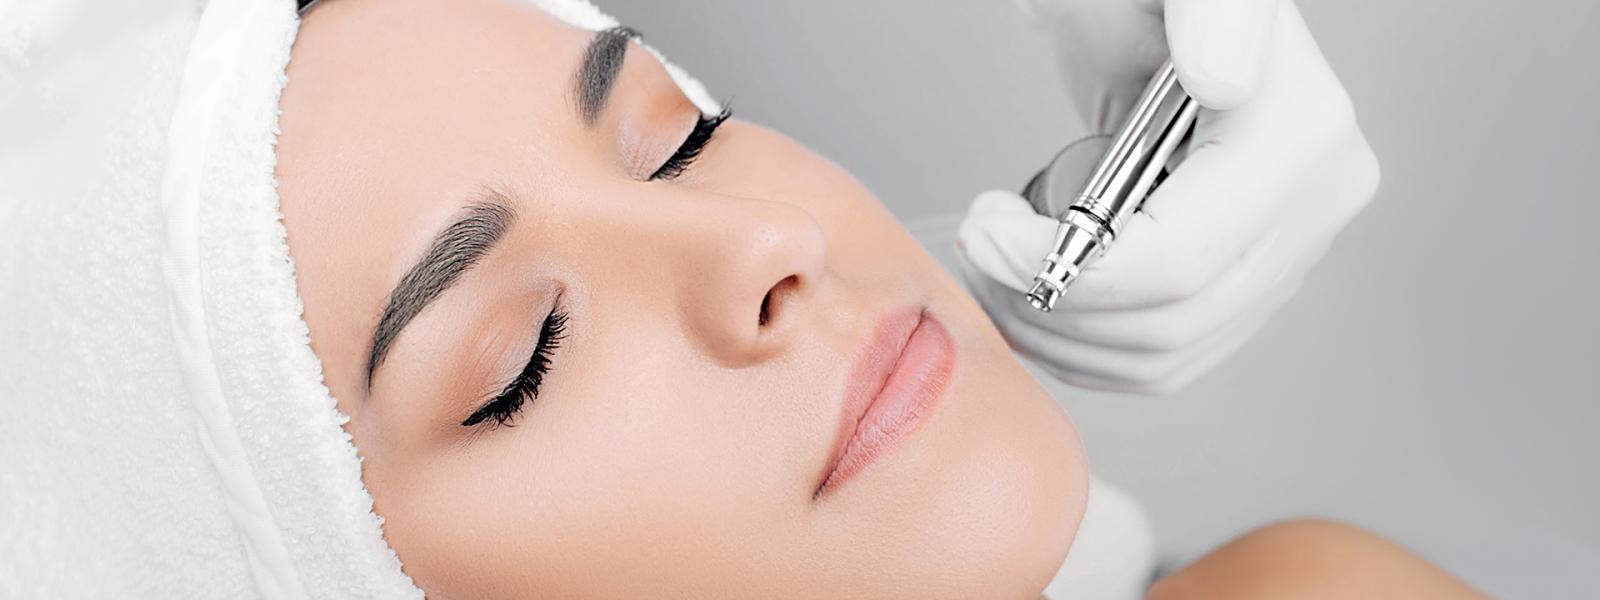 anti-aging face peel, procedure renewing skin , jet peeling